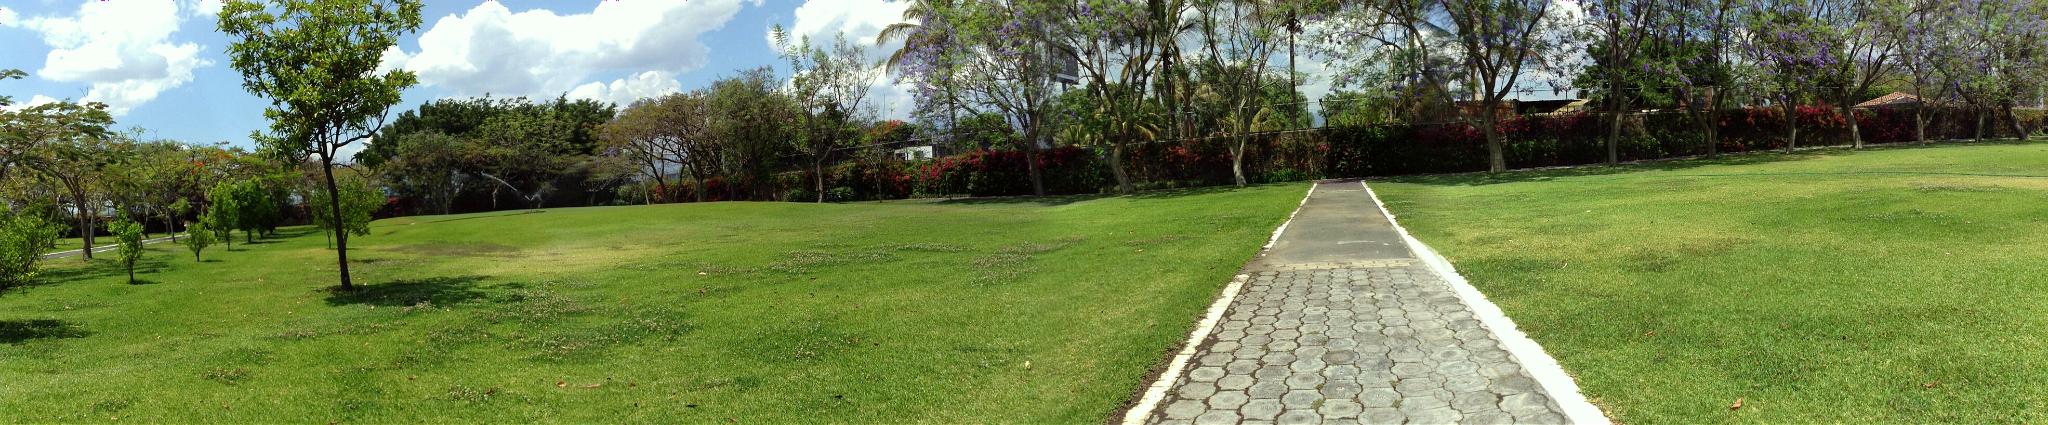 Jardines villa toscana 6.jpg